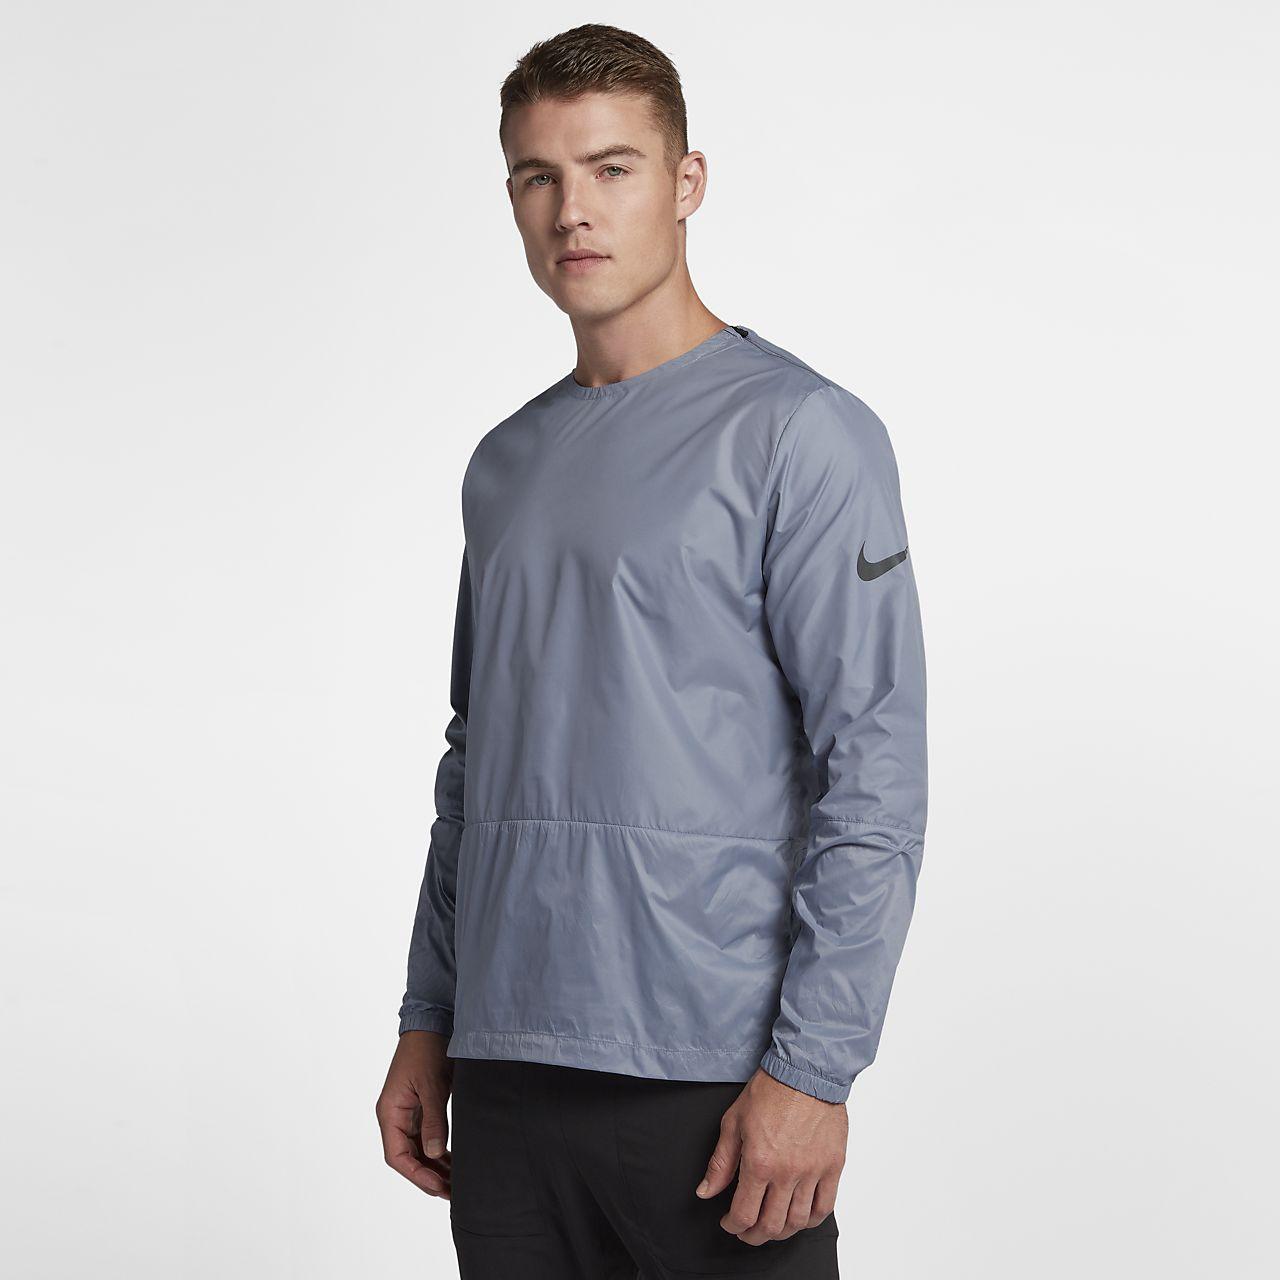 Nike Crew 男子跑步上衣